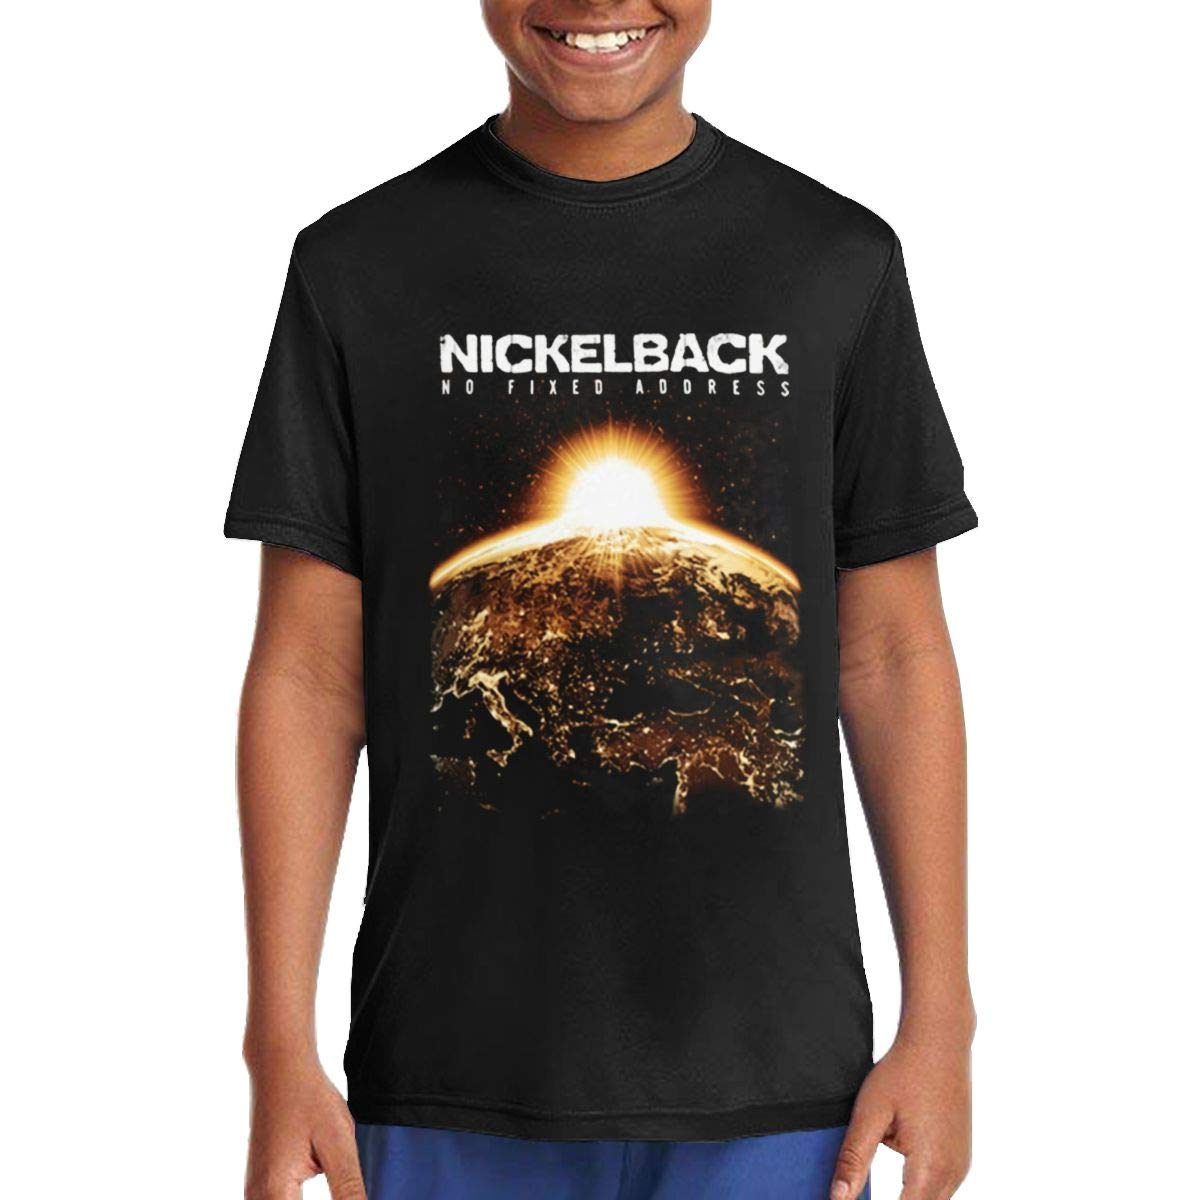 Moniqueabeech Nickelback Unisex Girls T Shirt Fashion T Shirt